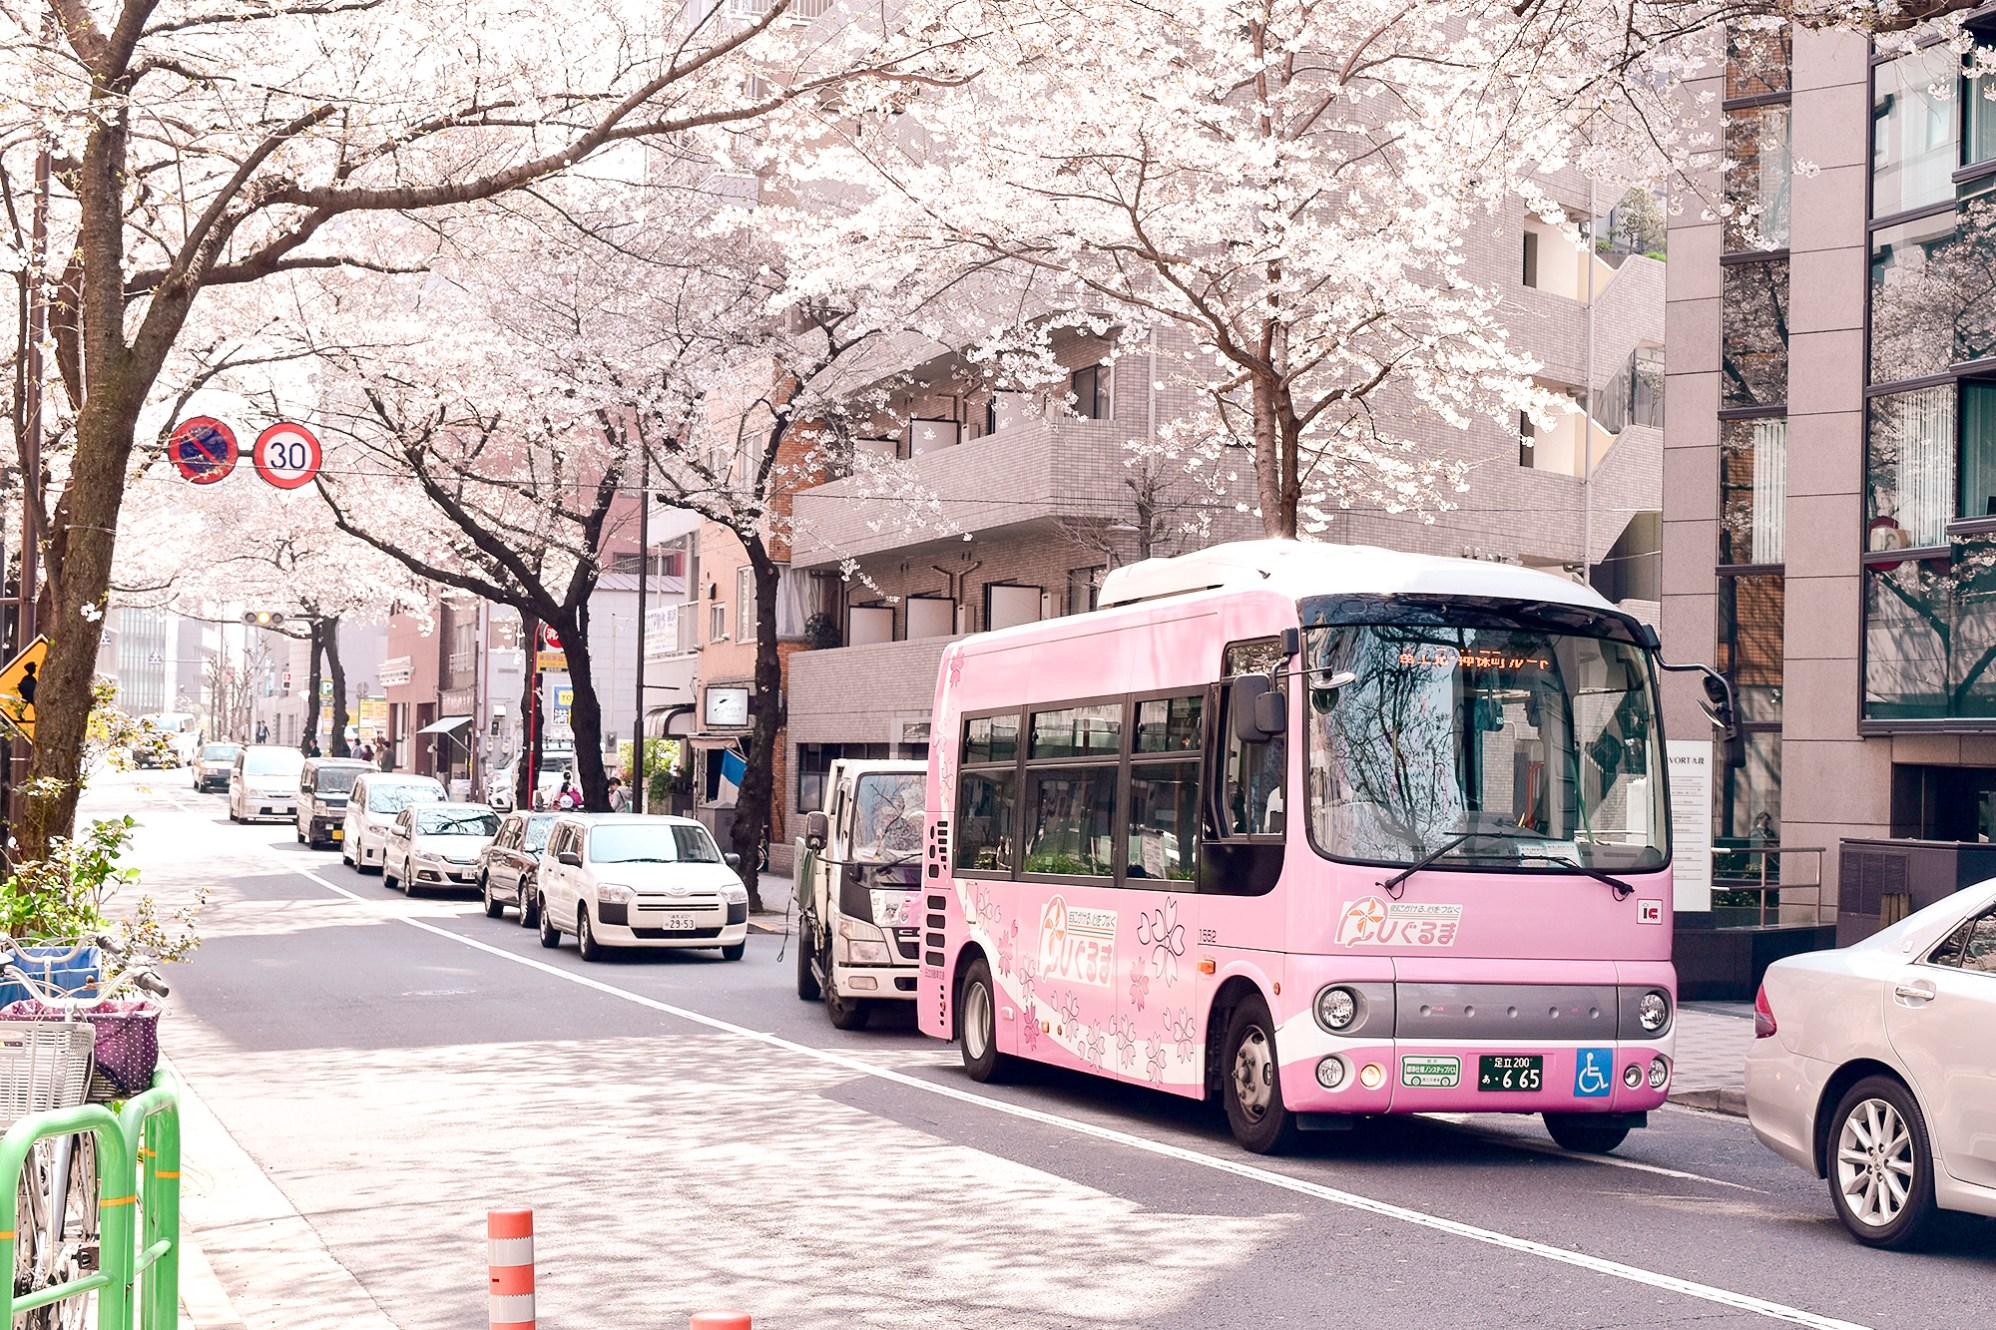 Sakura bus amongst the sakura